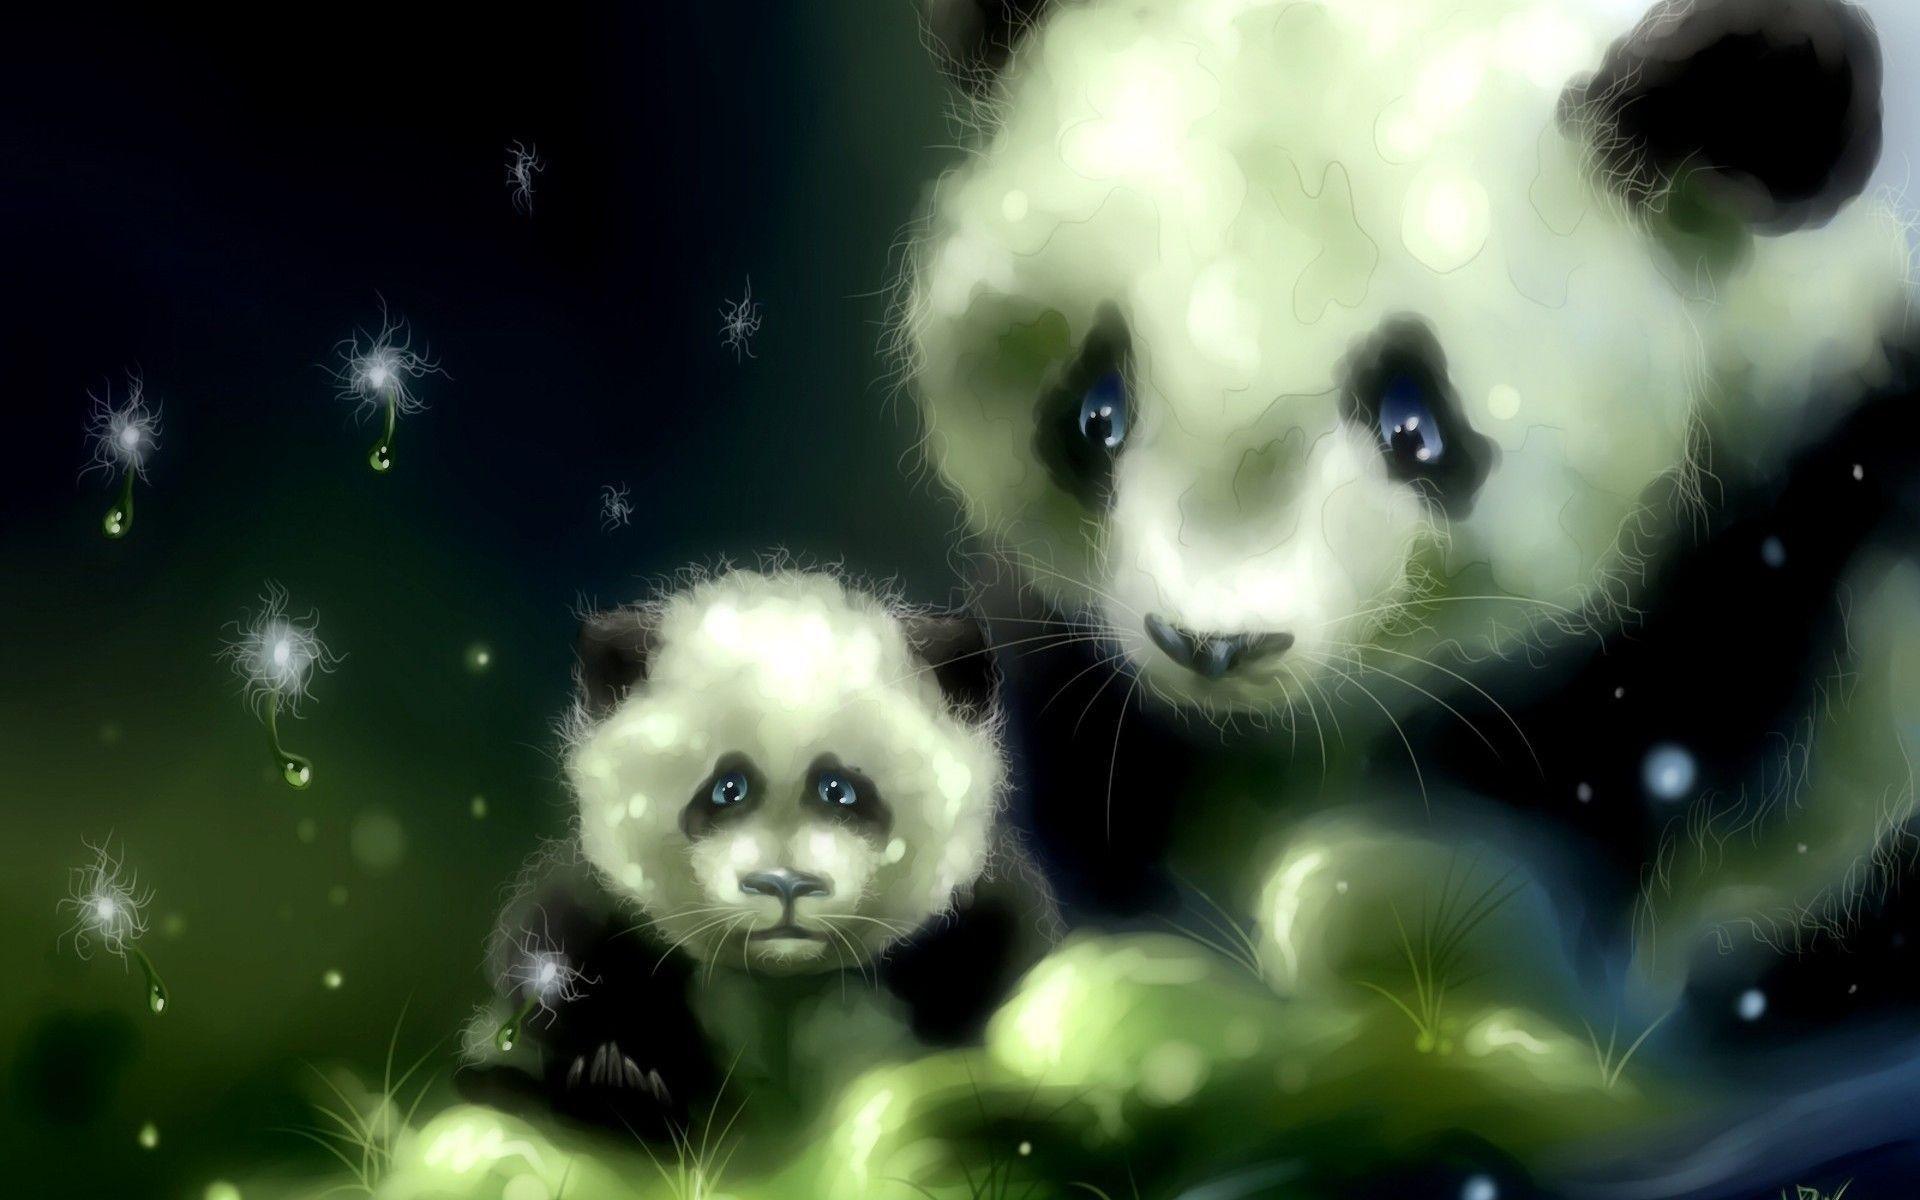 Cute Panda Backgrounds – Bing images